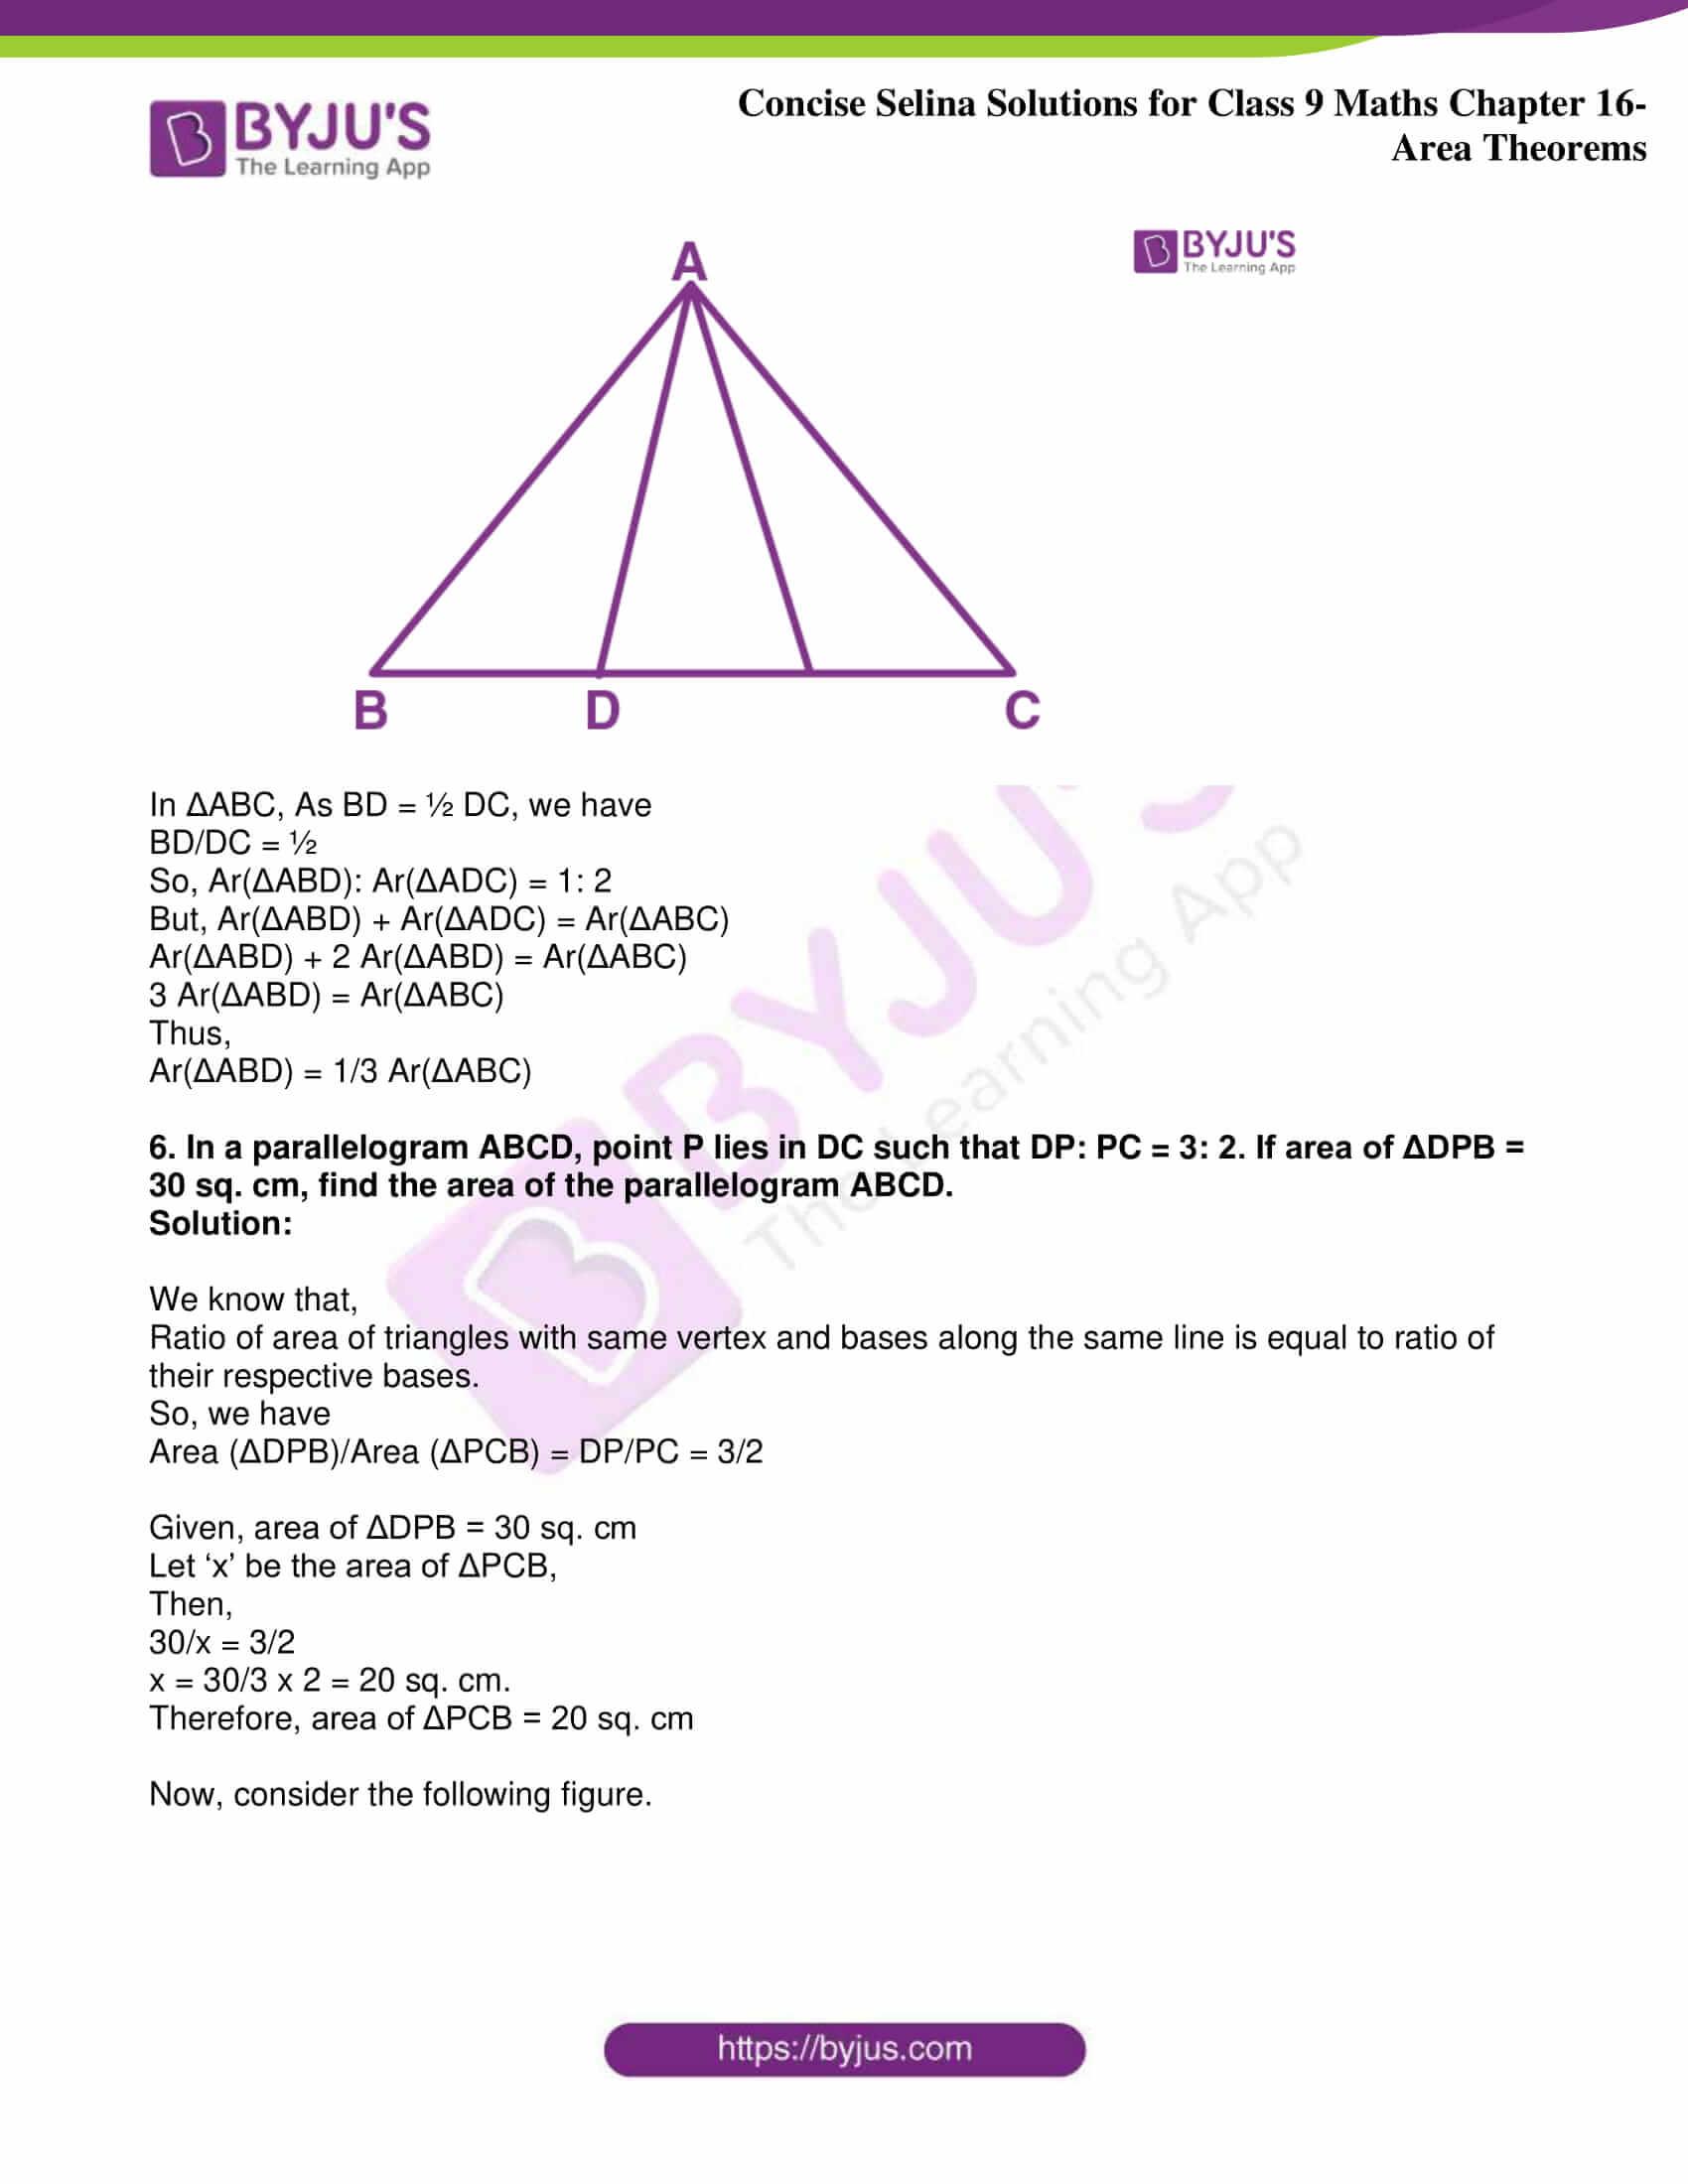 icse class 9 jun9 maths selina solutions chapter 16 area theorems 21